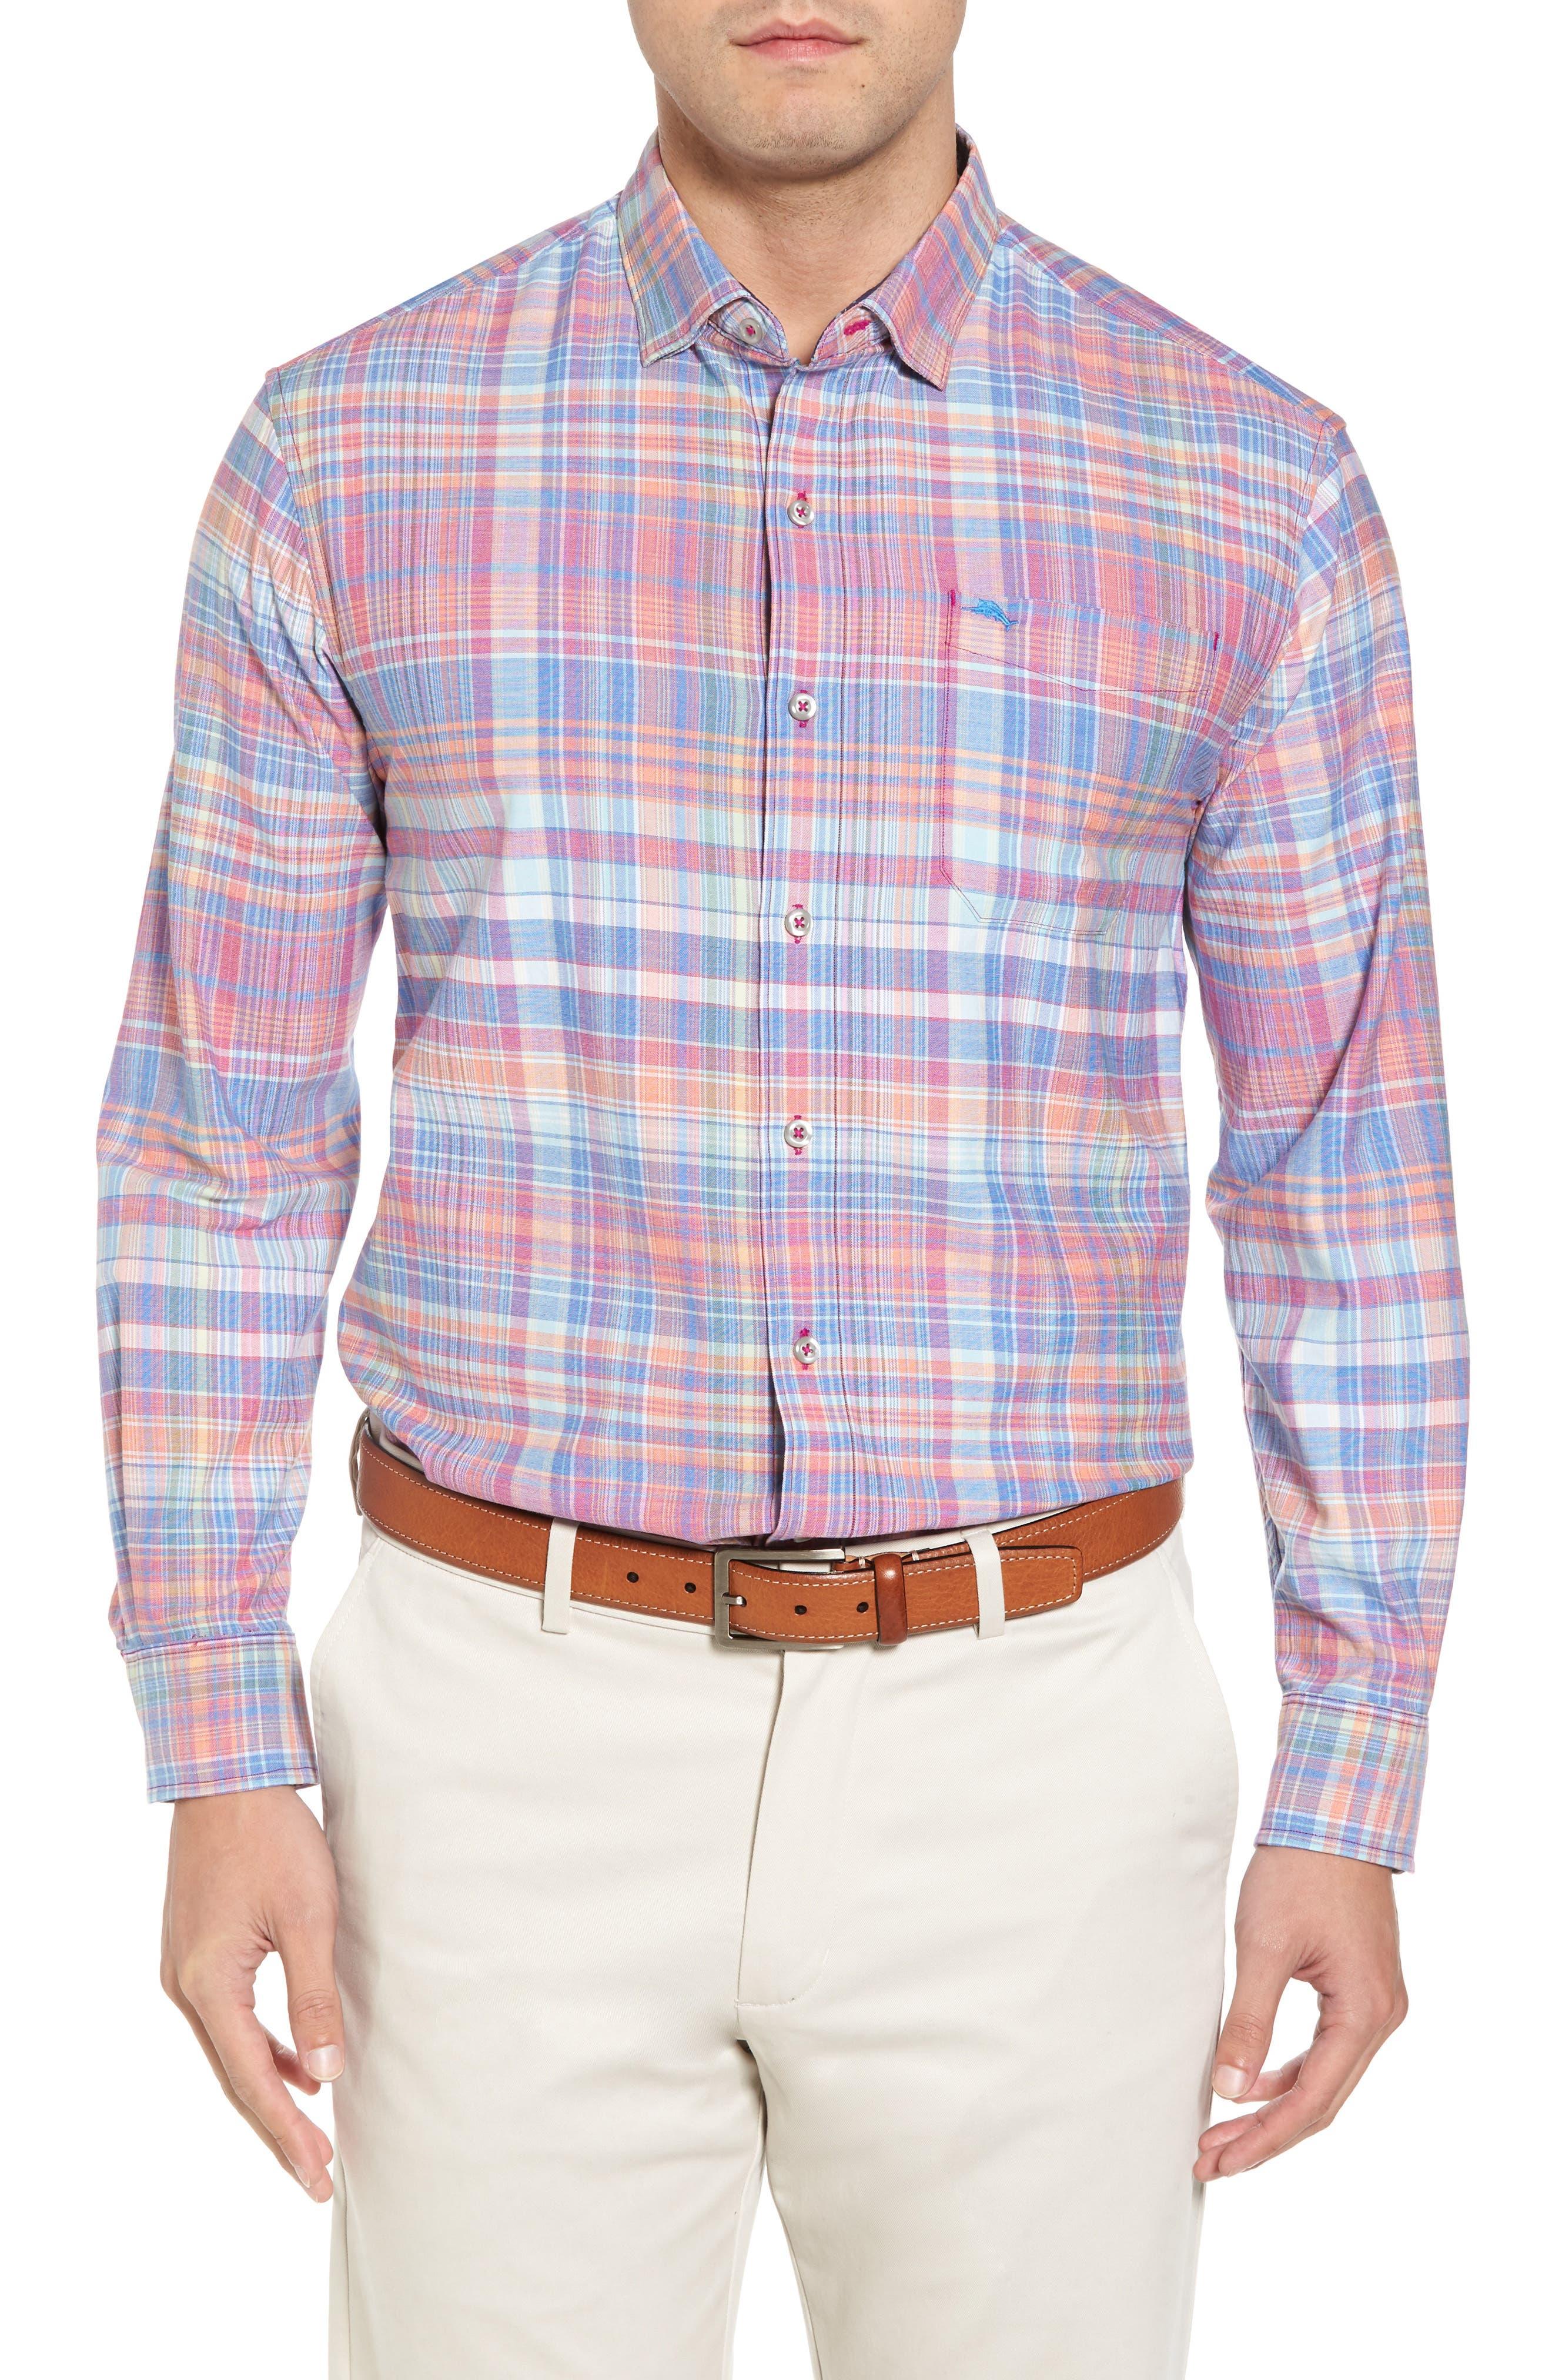 Mangrove Madras Regular Fit Sport Shirt,                             Main thumbnail 1, color,                             650